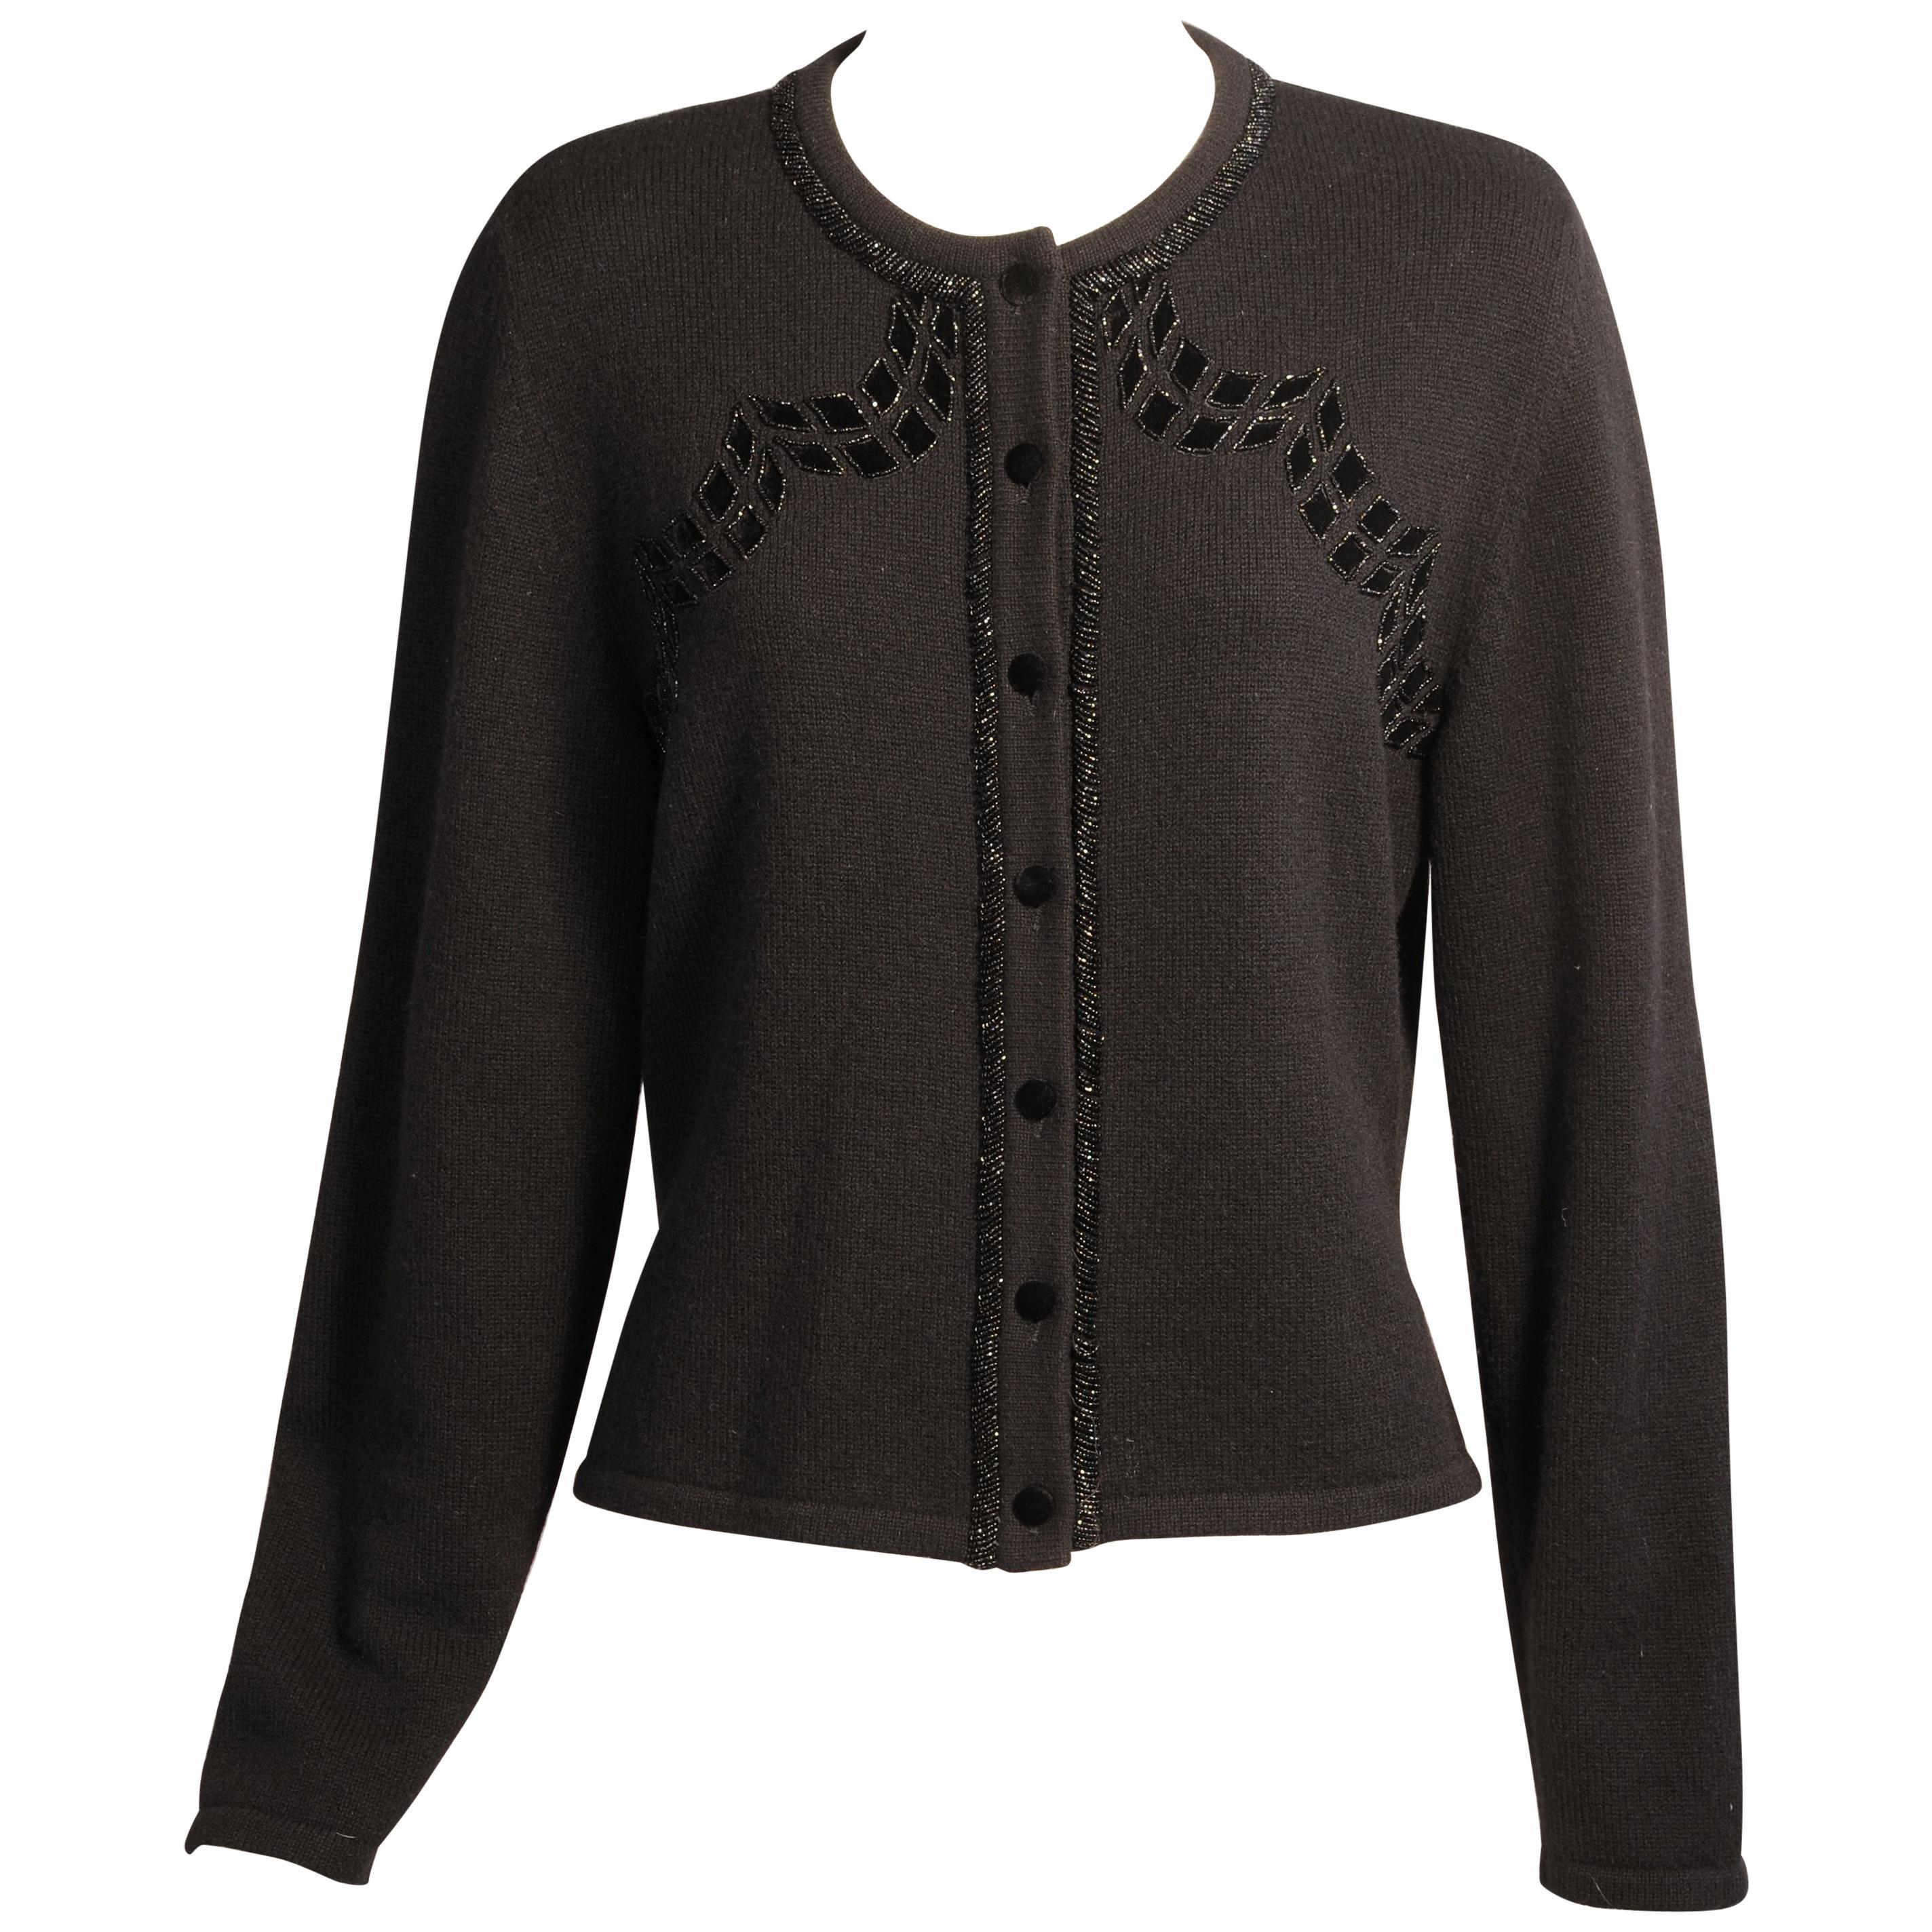 Cardigan Sale Appliqued For Carolina and Herrera Sweater Beaded Cashmere wR8qXZ8